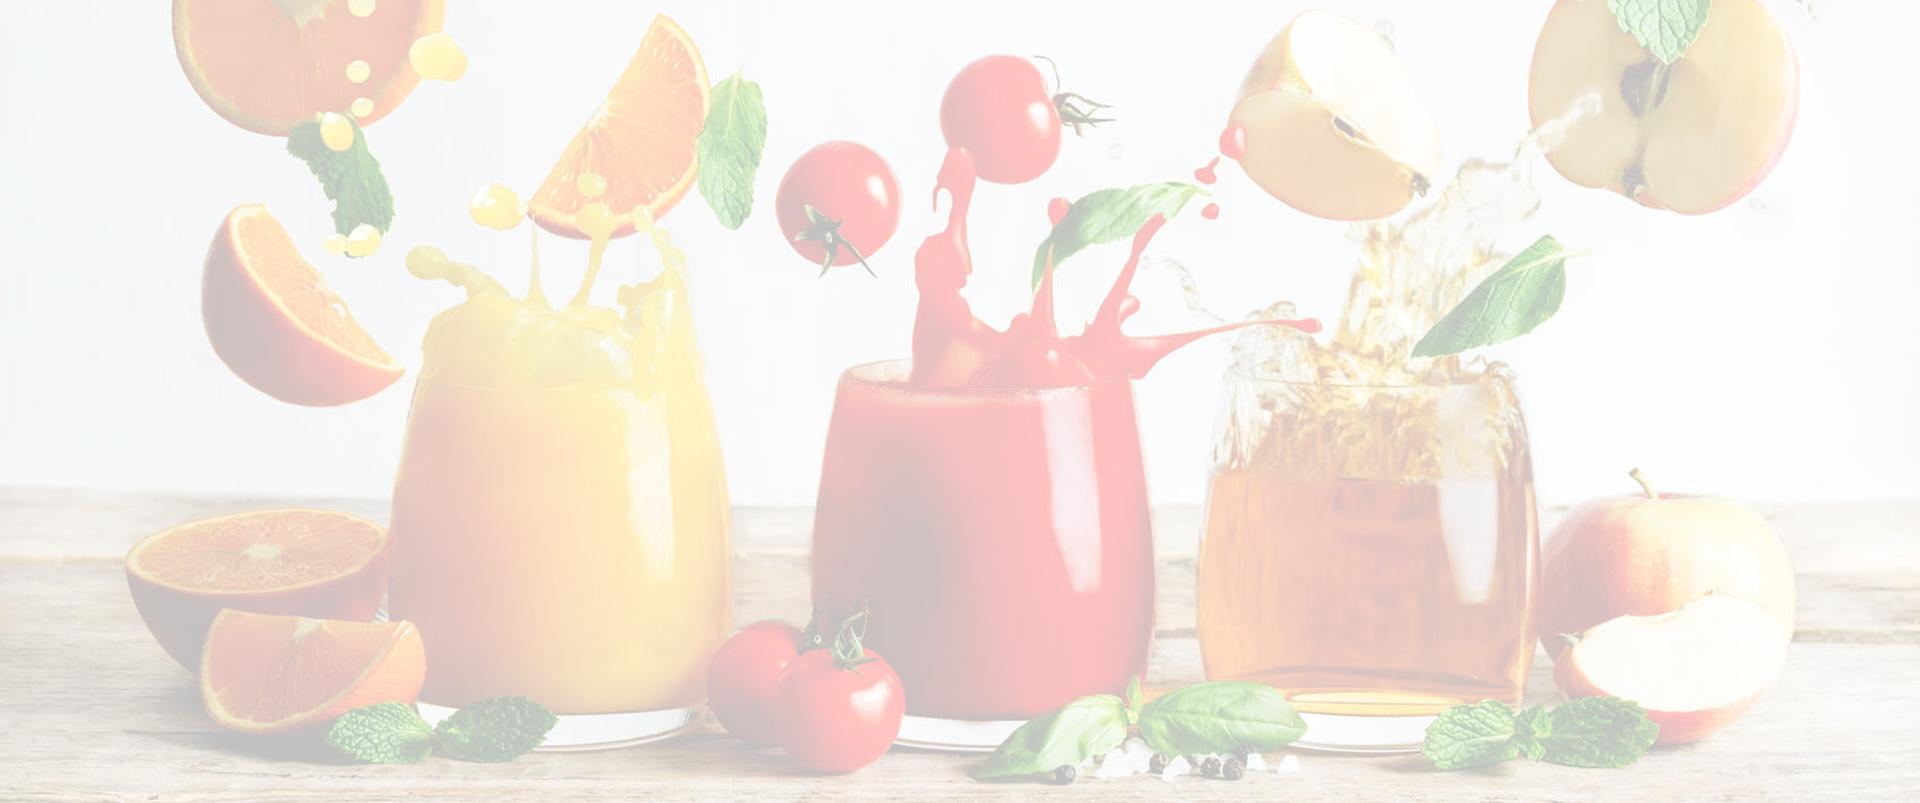 vitamine-integratori-torino-sanmauro